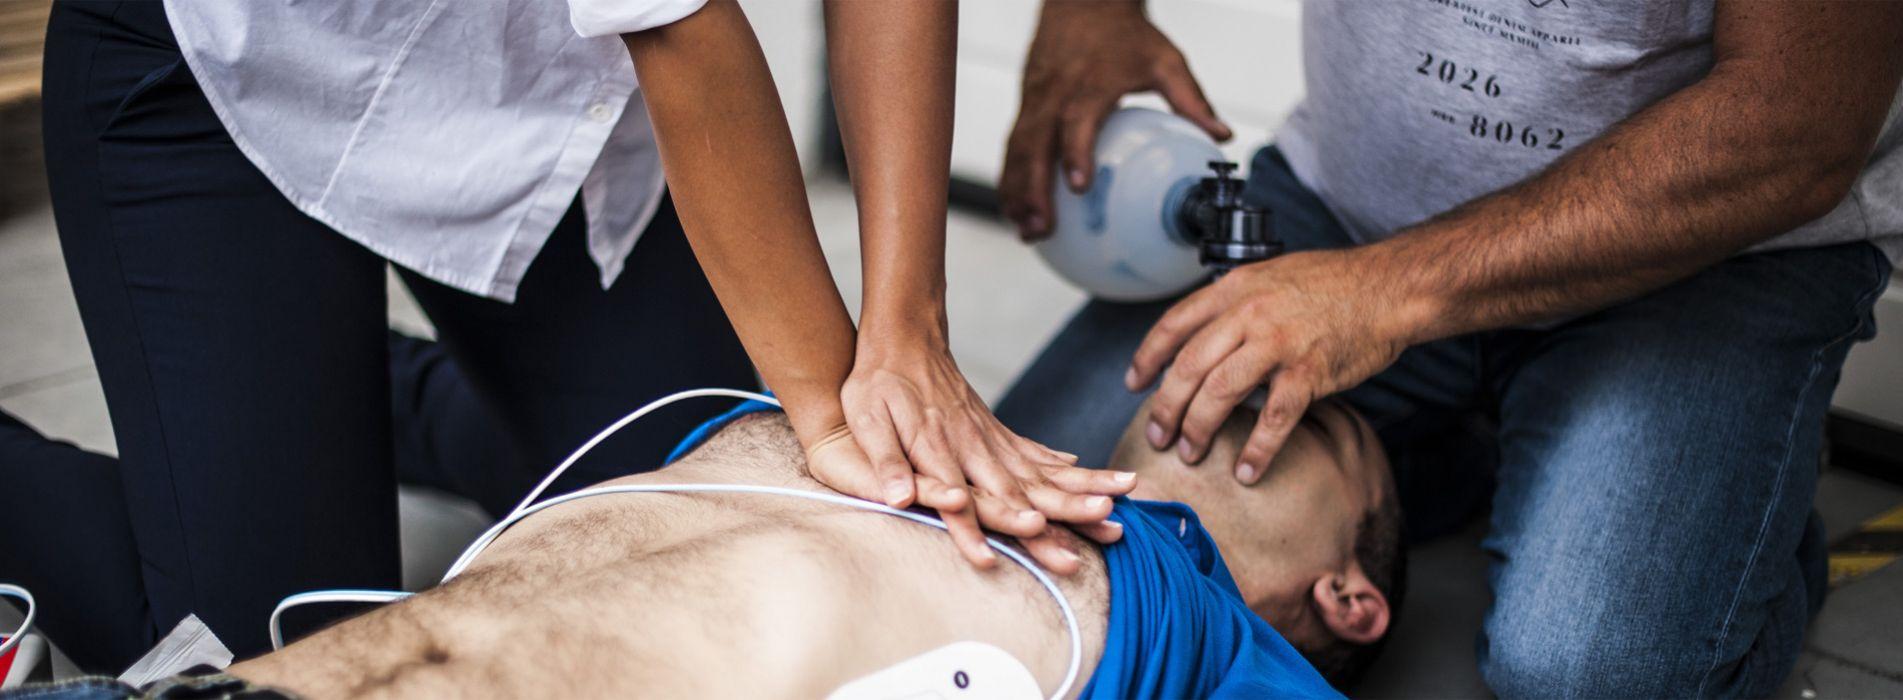 stratford-upon-avon first aid